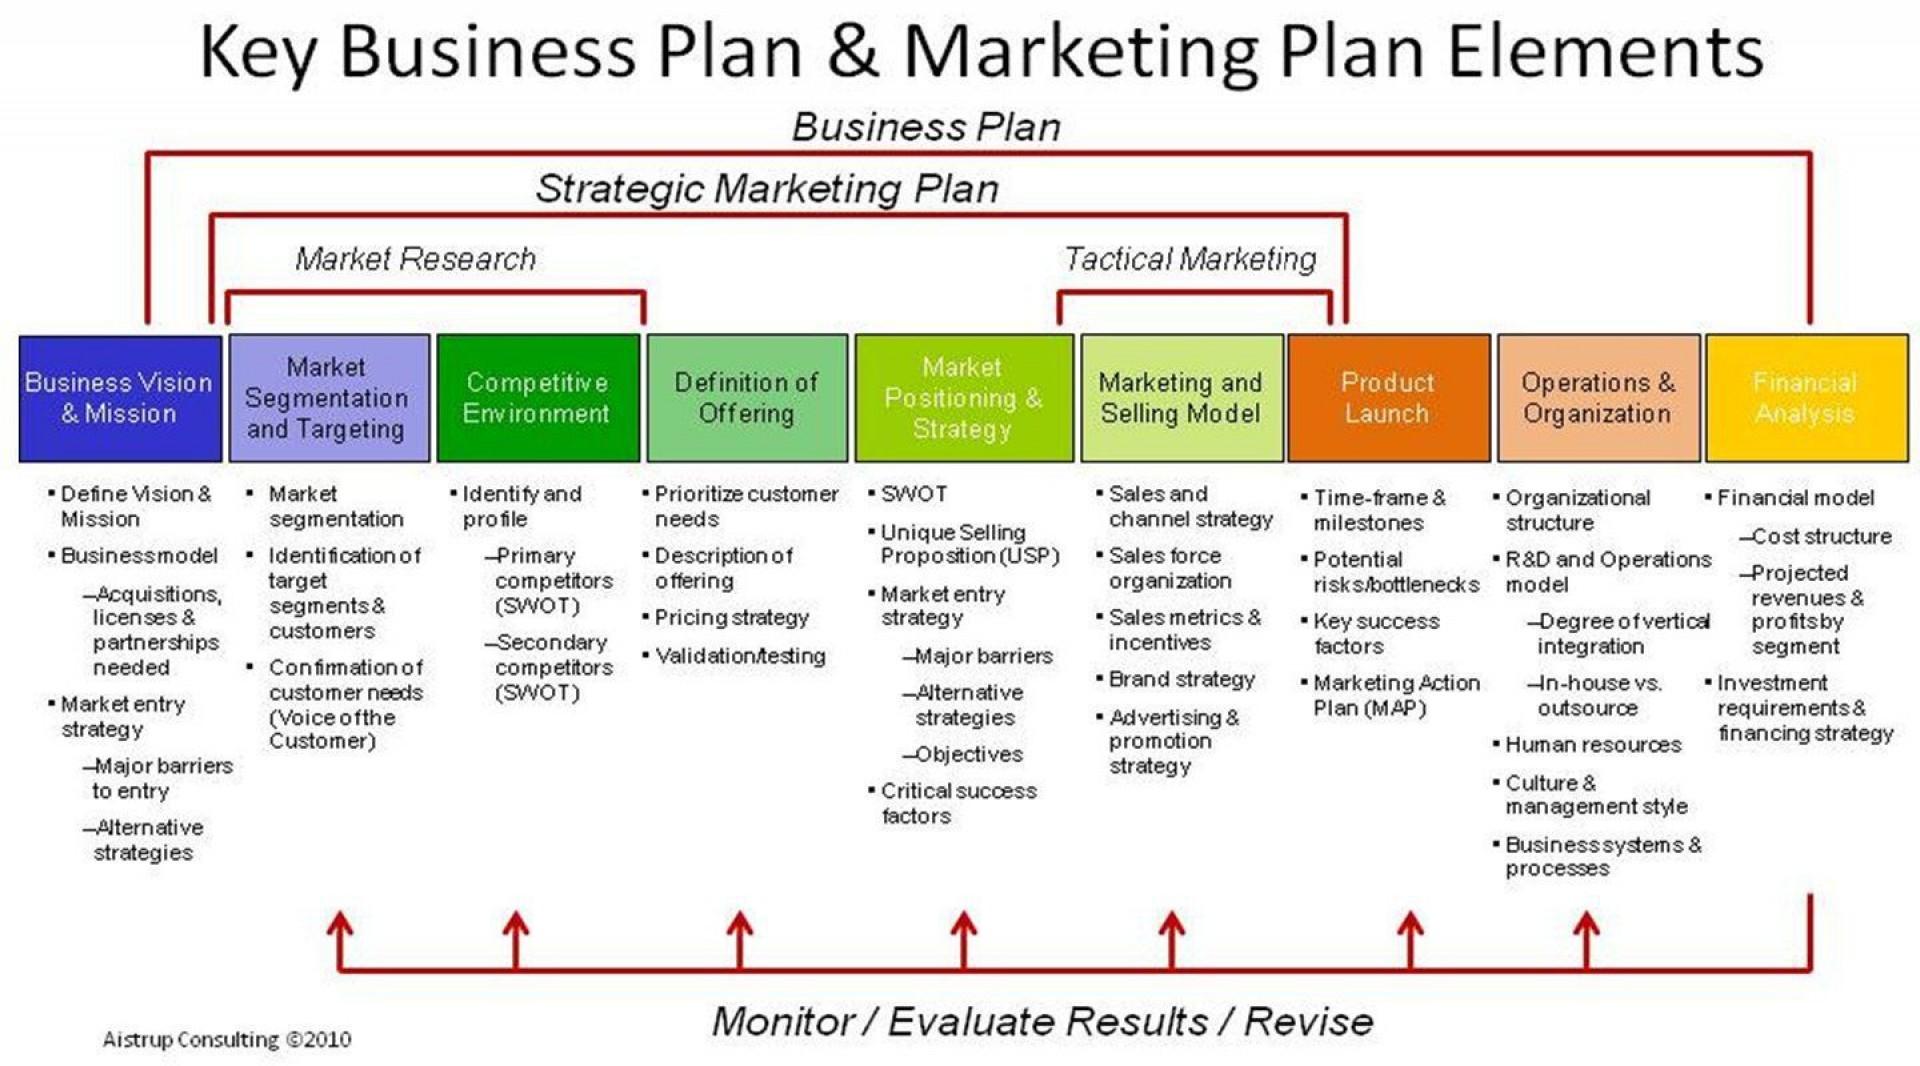 005 Wondrou Strategic Busines Plan Template Image  Doc Word Sample1920